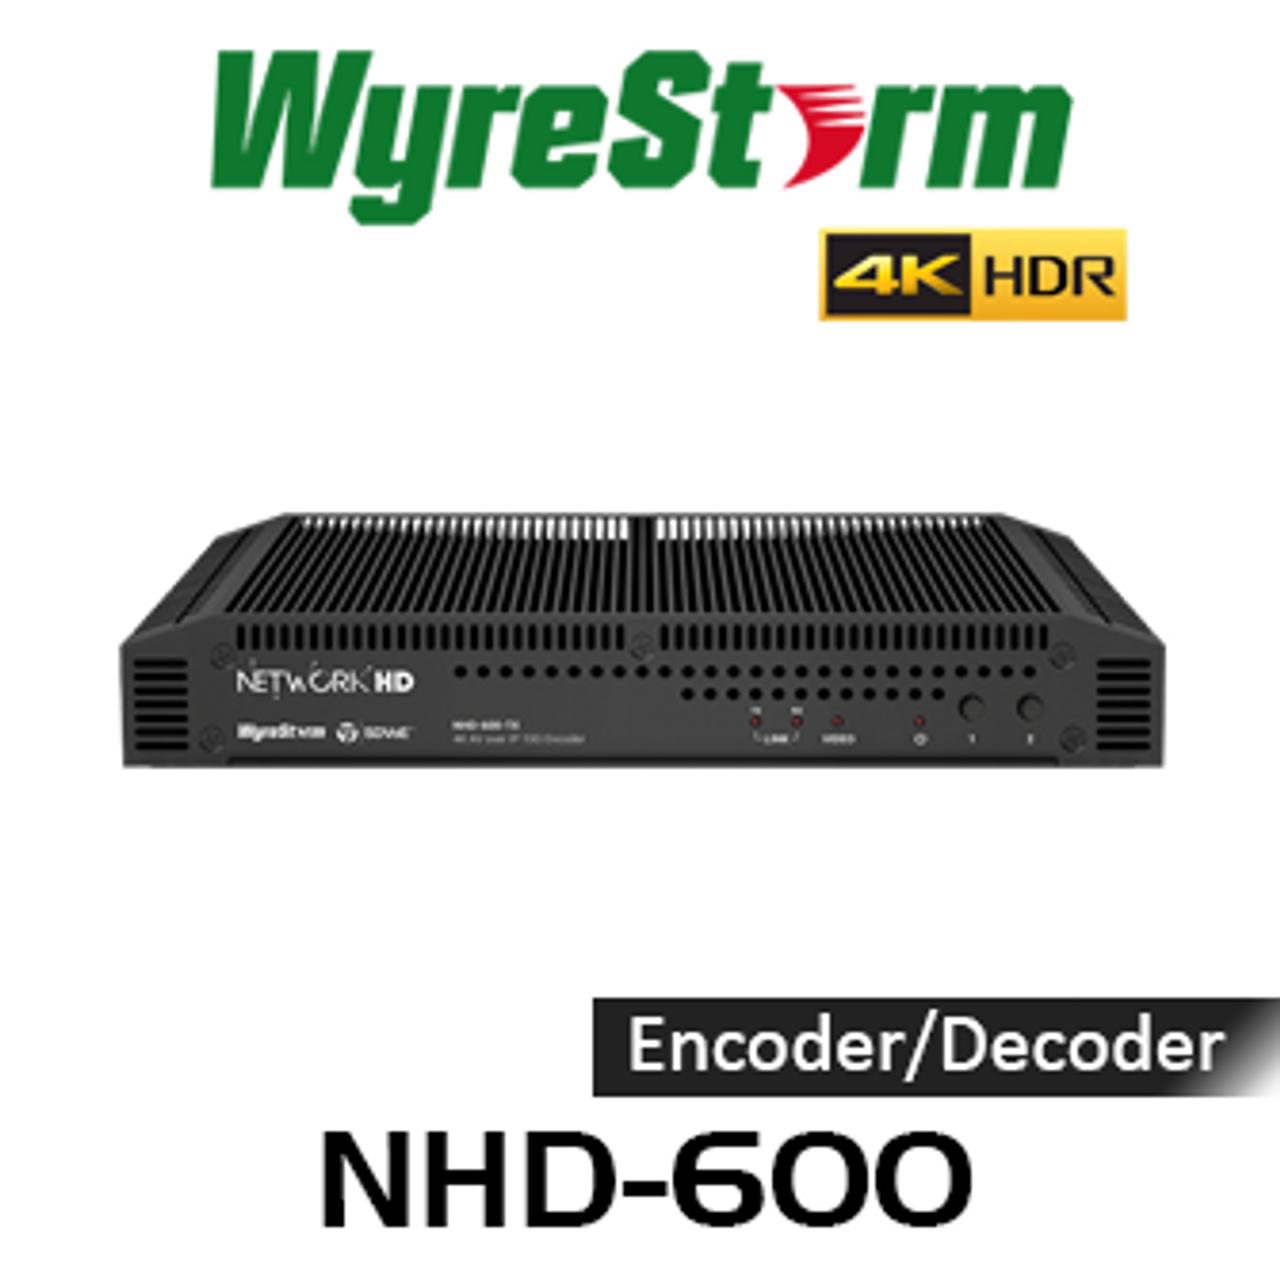 WyreStorm NetworkHD 600 4K HDR AV Over 10GB IP Network SDVoE Encoder /  Decoder